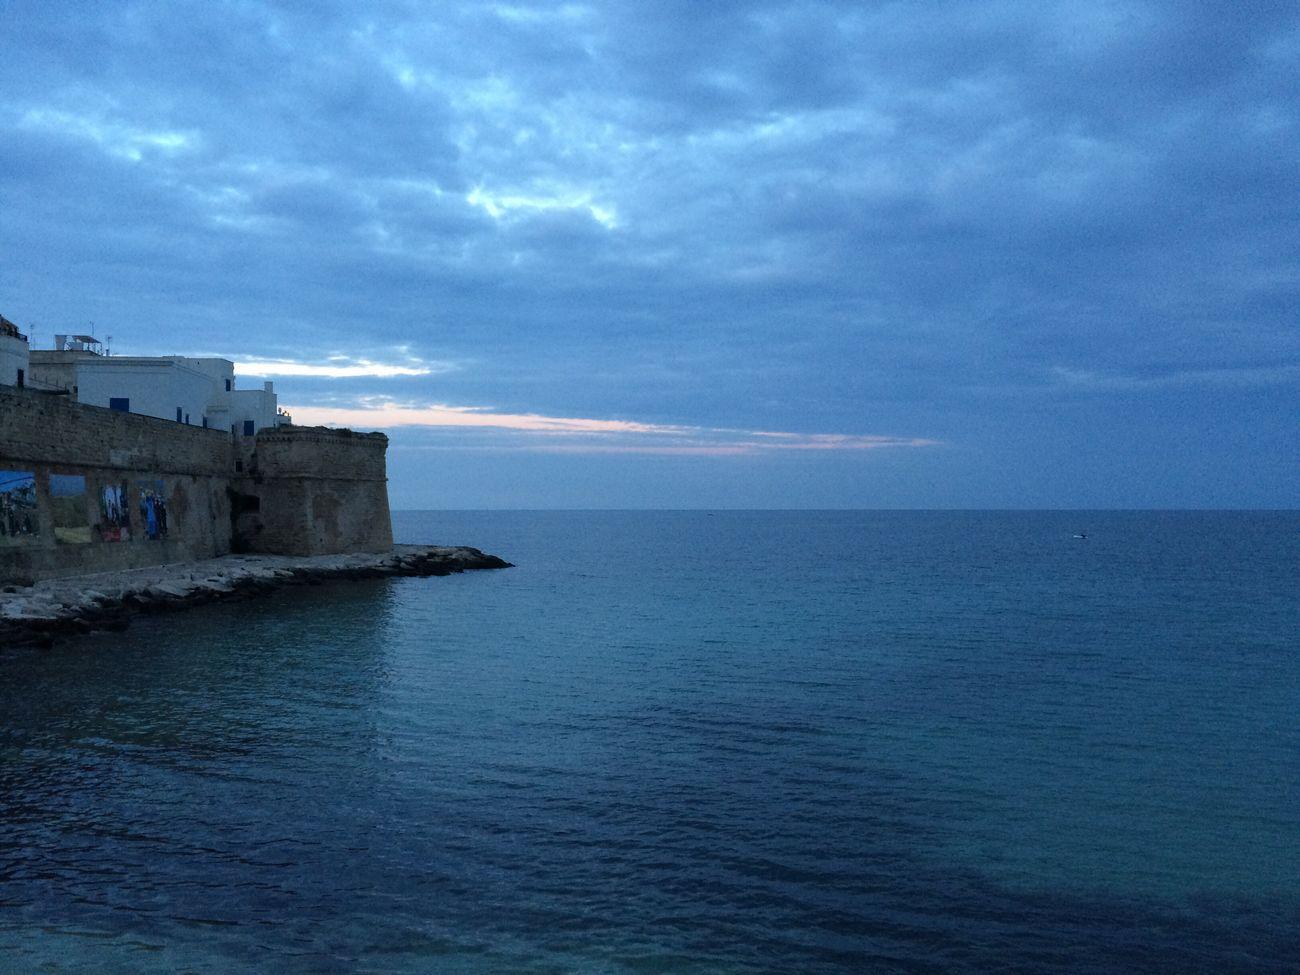 Enjoying Life Seaside Sealove Sea And Sky Beauty In Nature Feeling Thankful EyeEm Nature Lover Eveningwalk